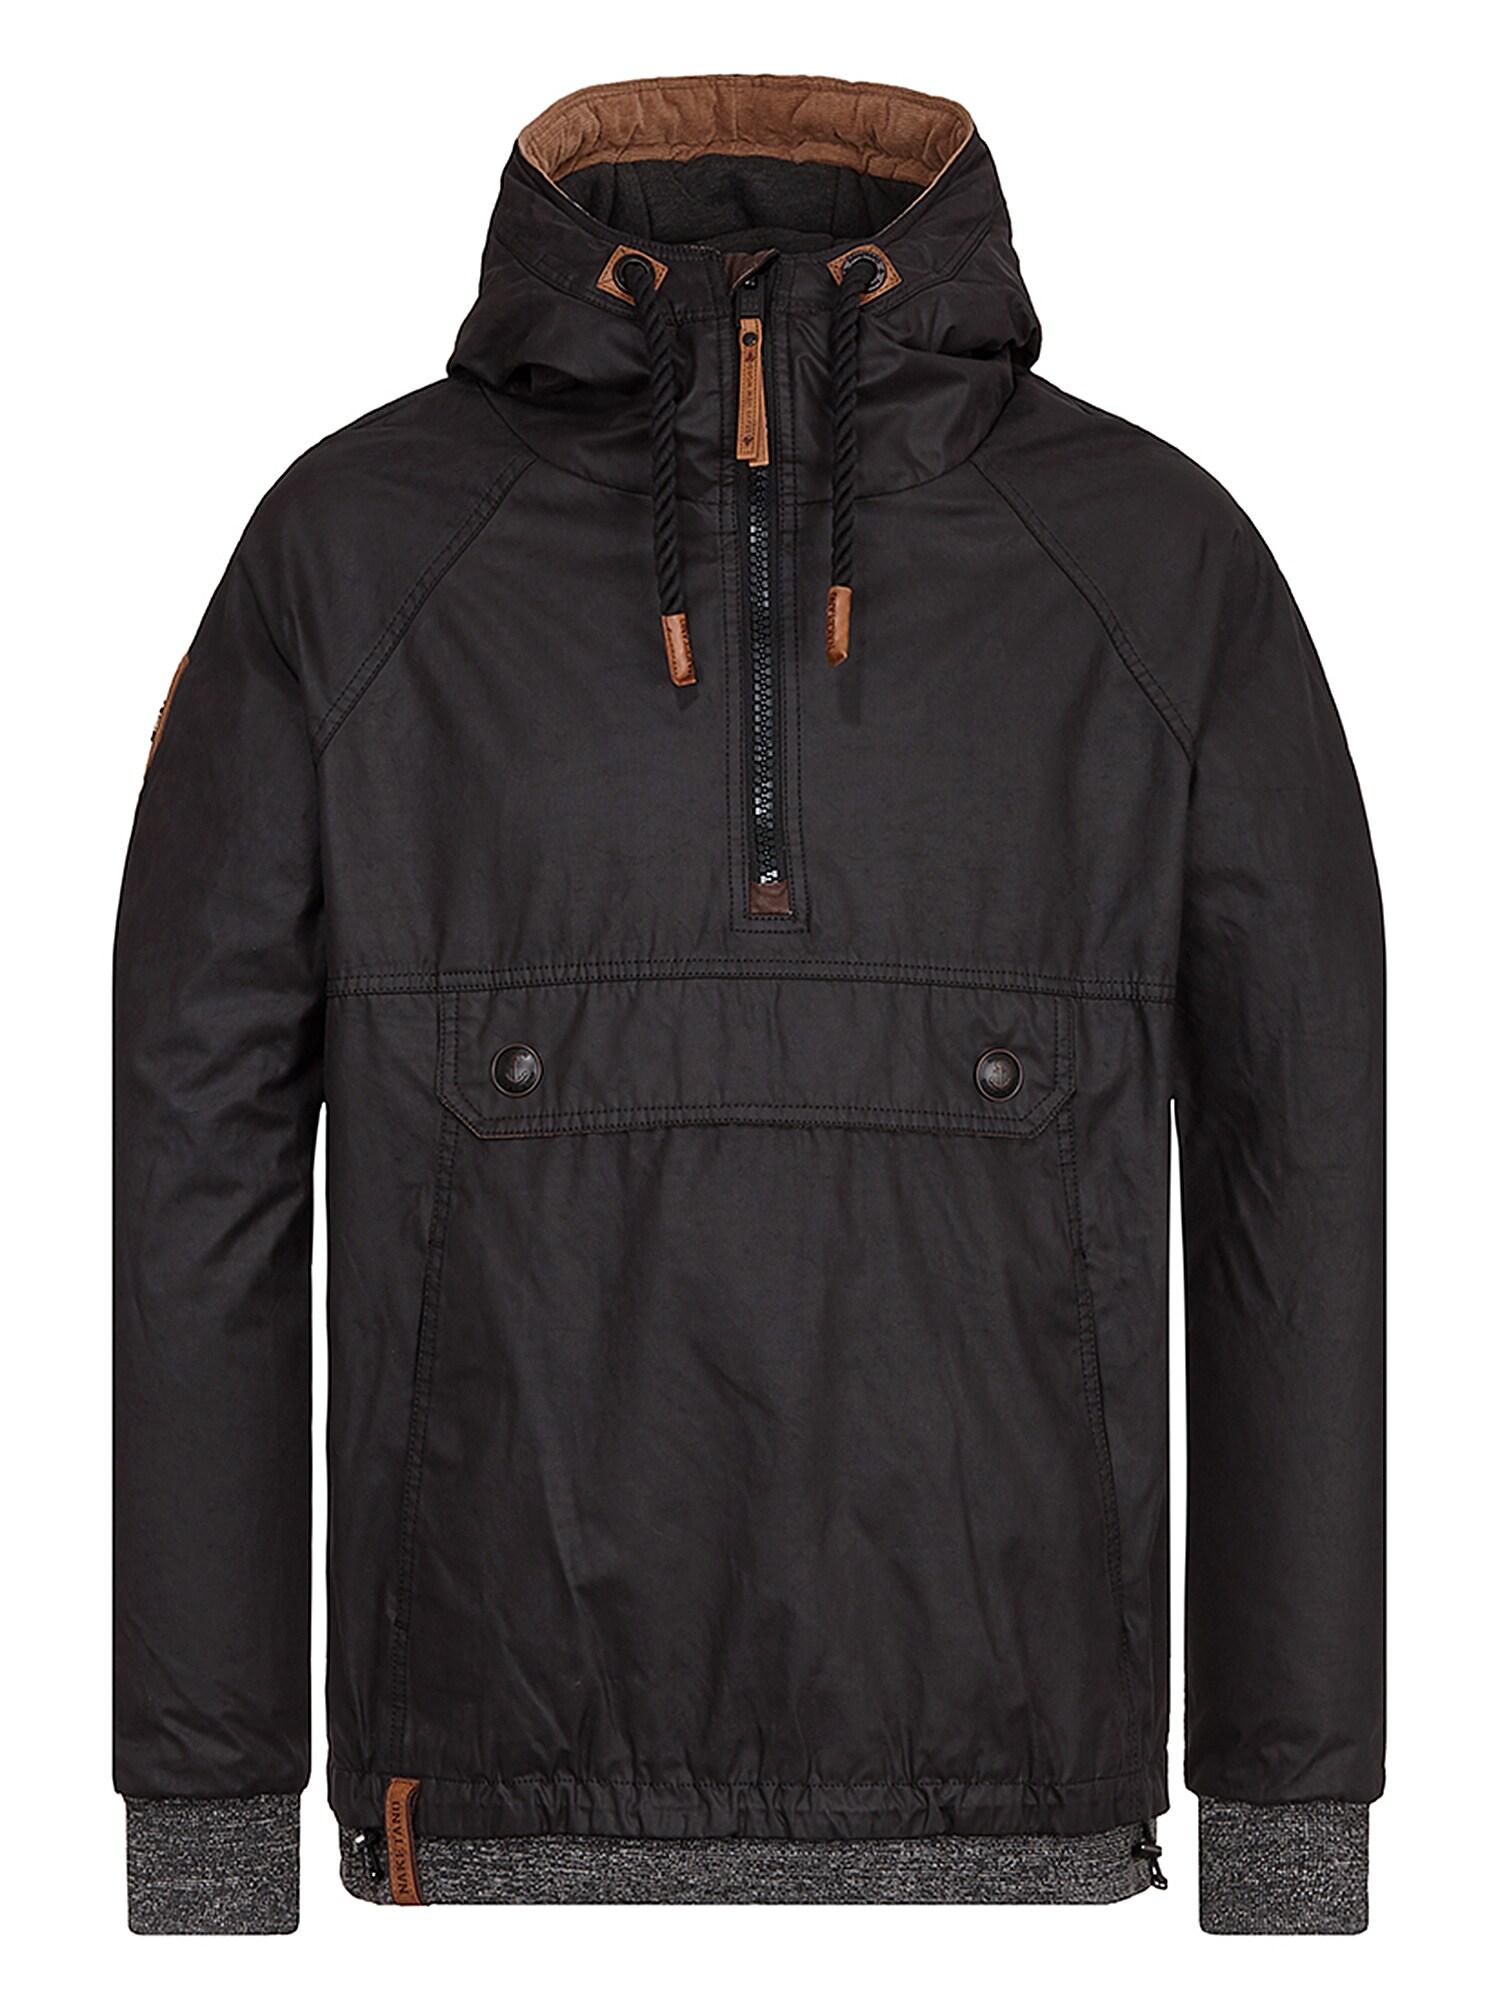 Zimní bunda Hartgekochte Eierklatscher černá Naketano